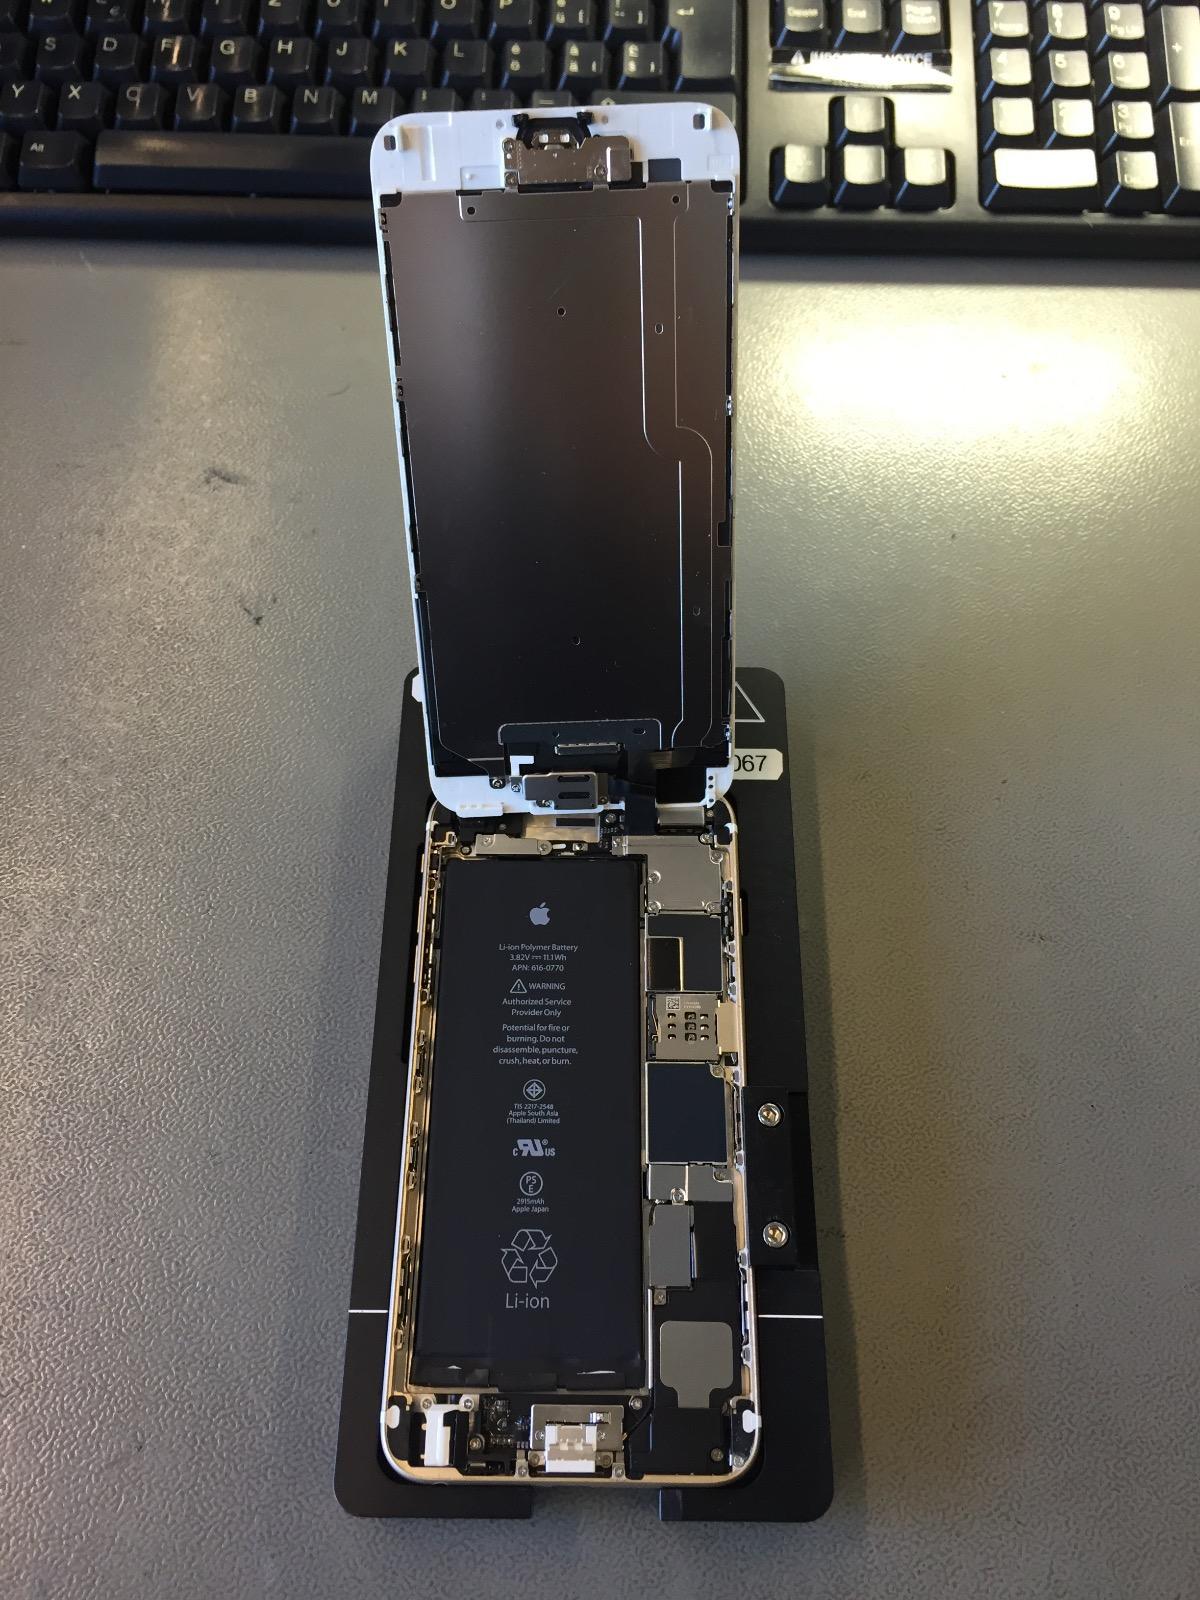 iphone 6 plus innenleben